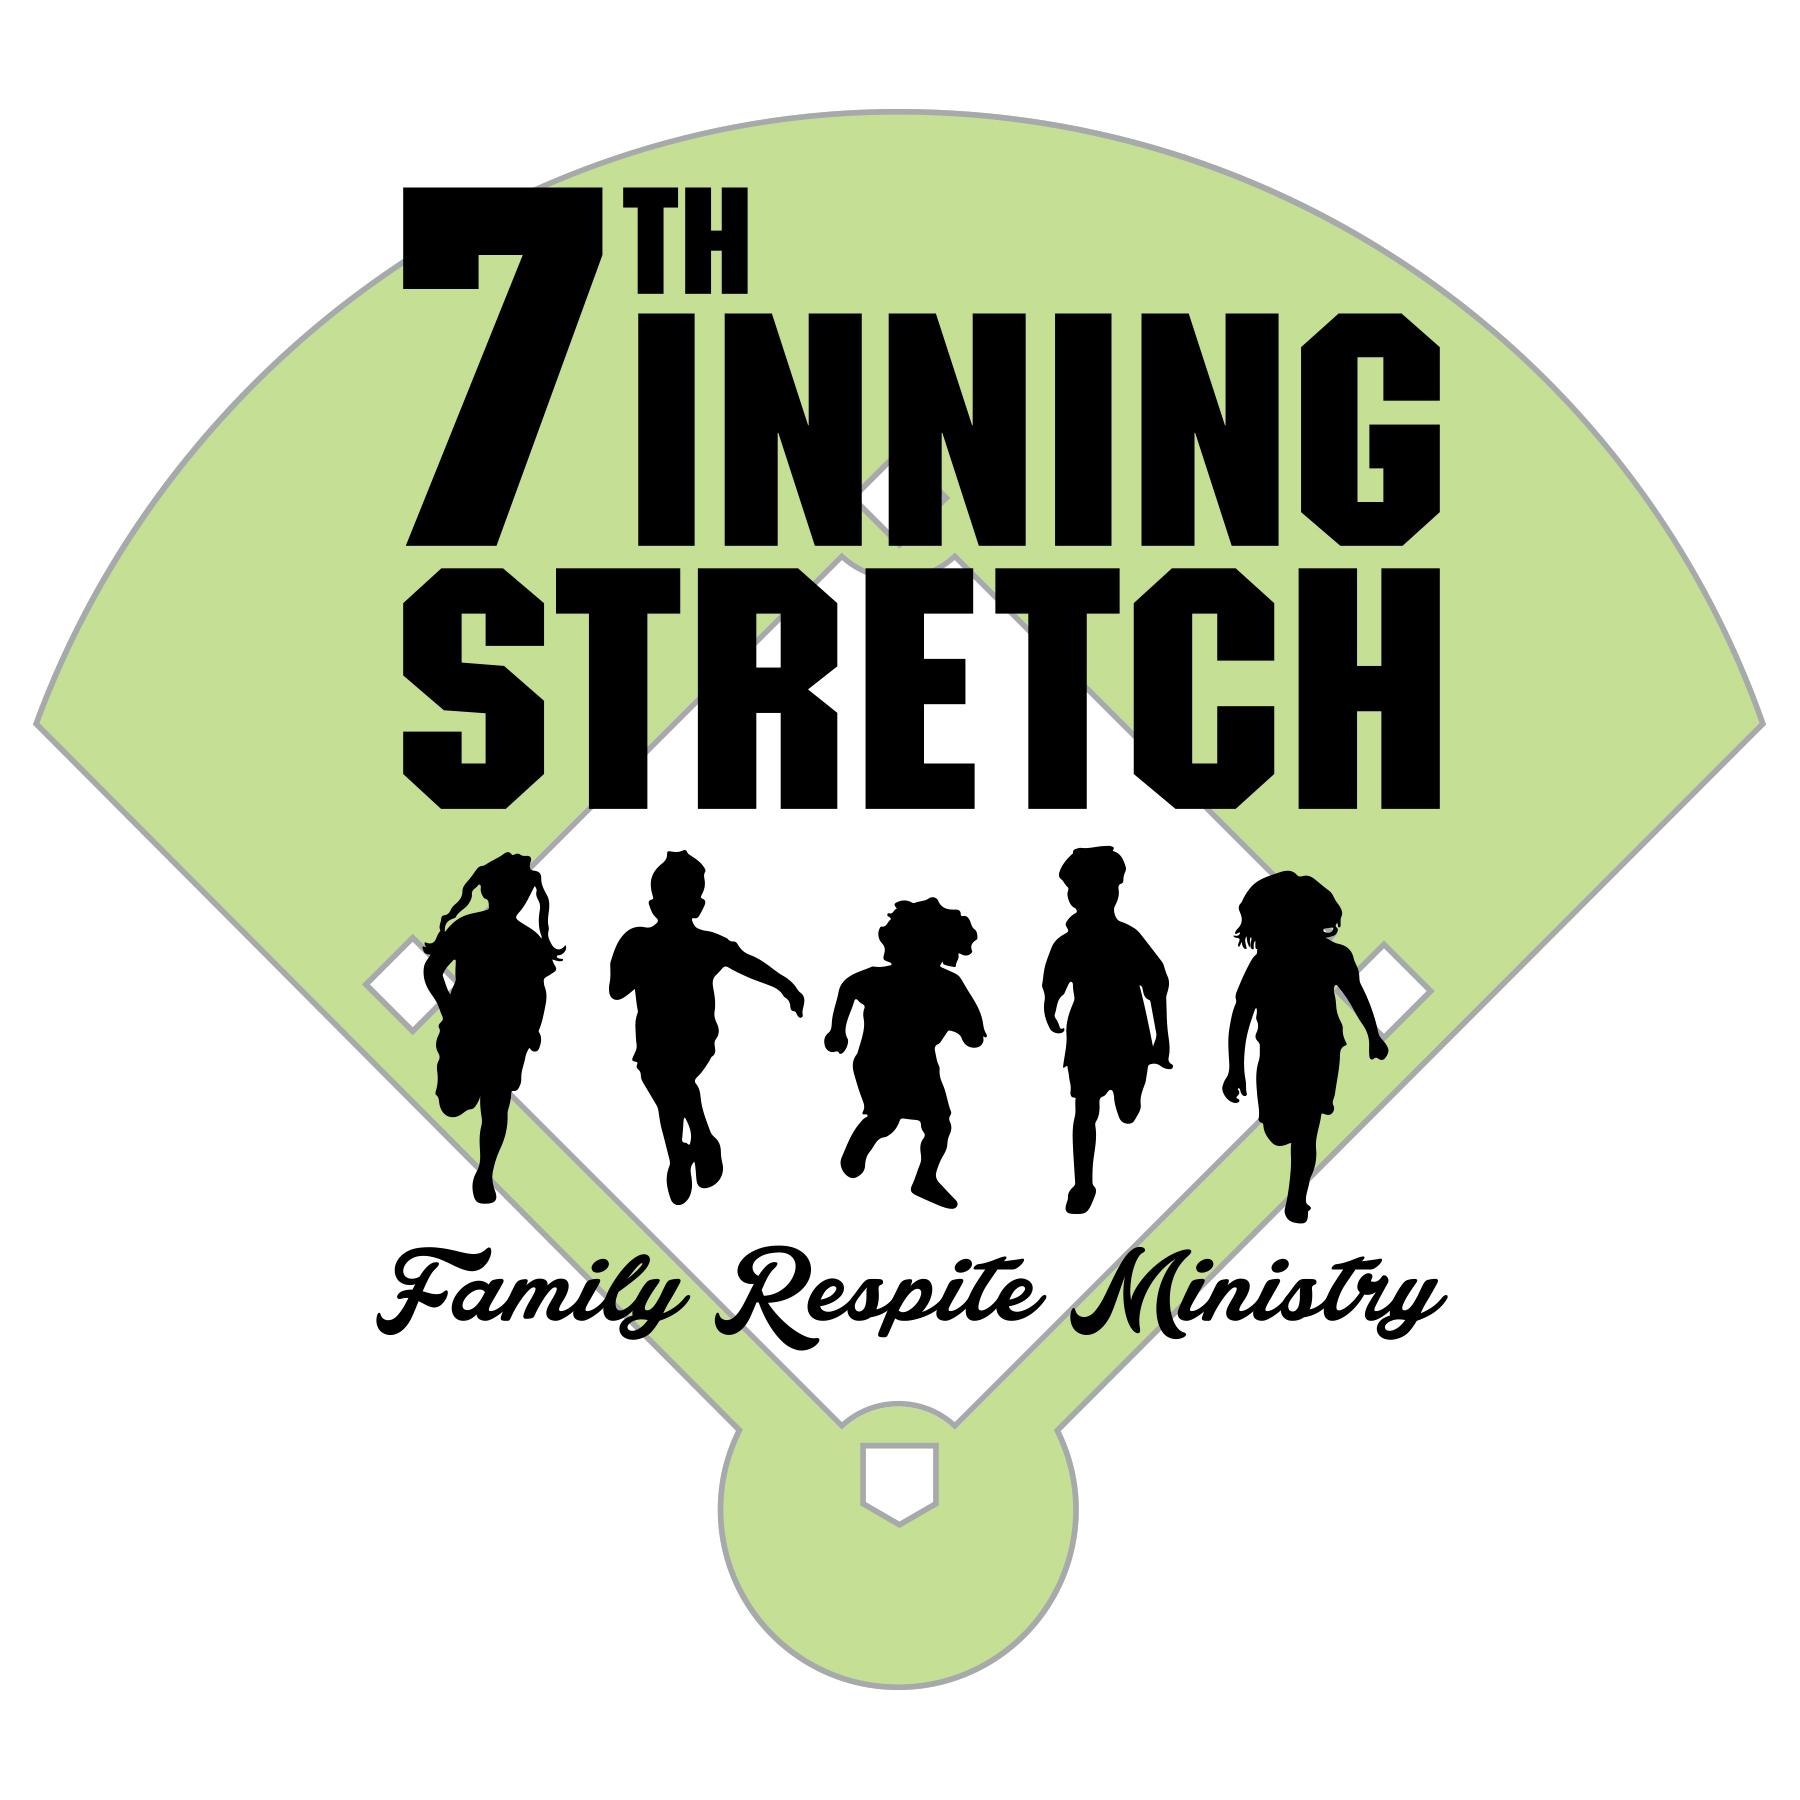 7thinningstretch logo